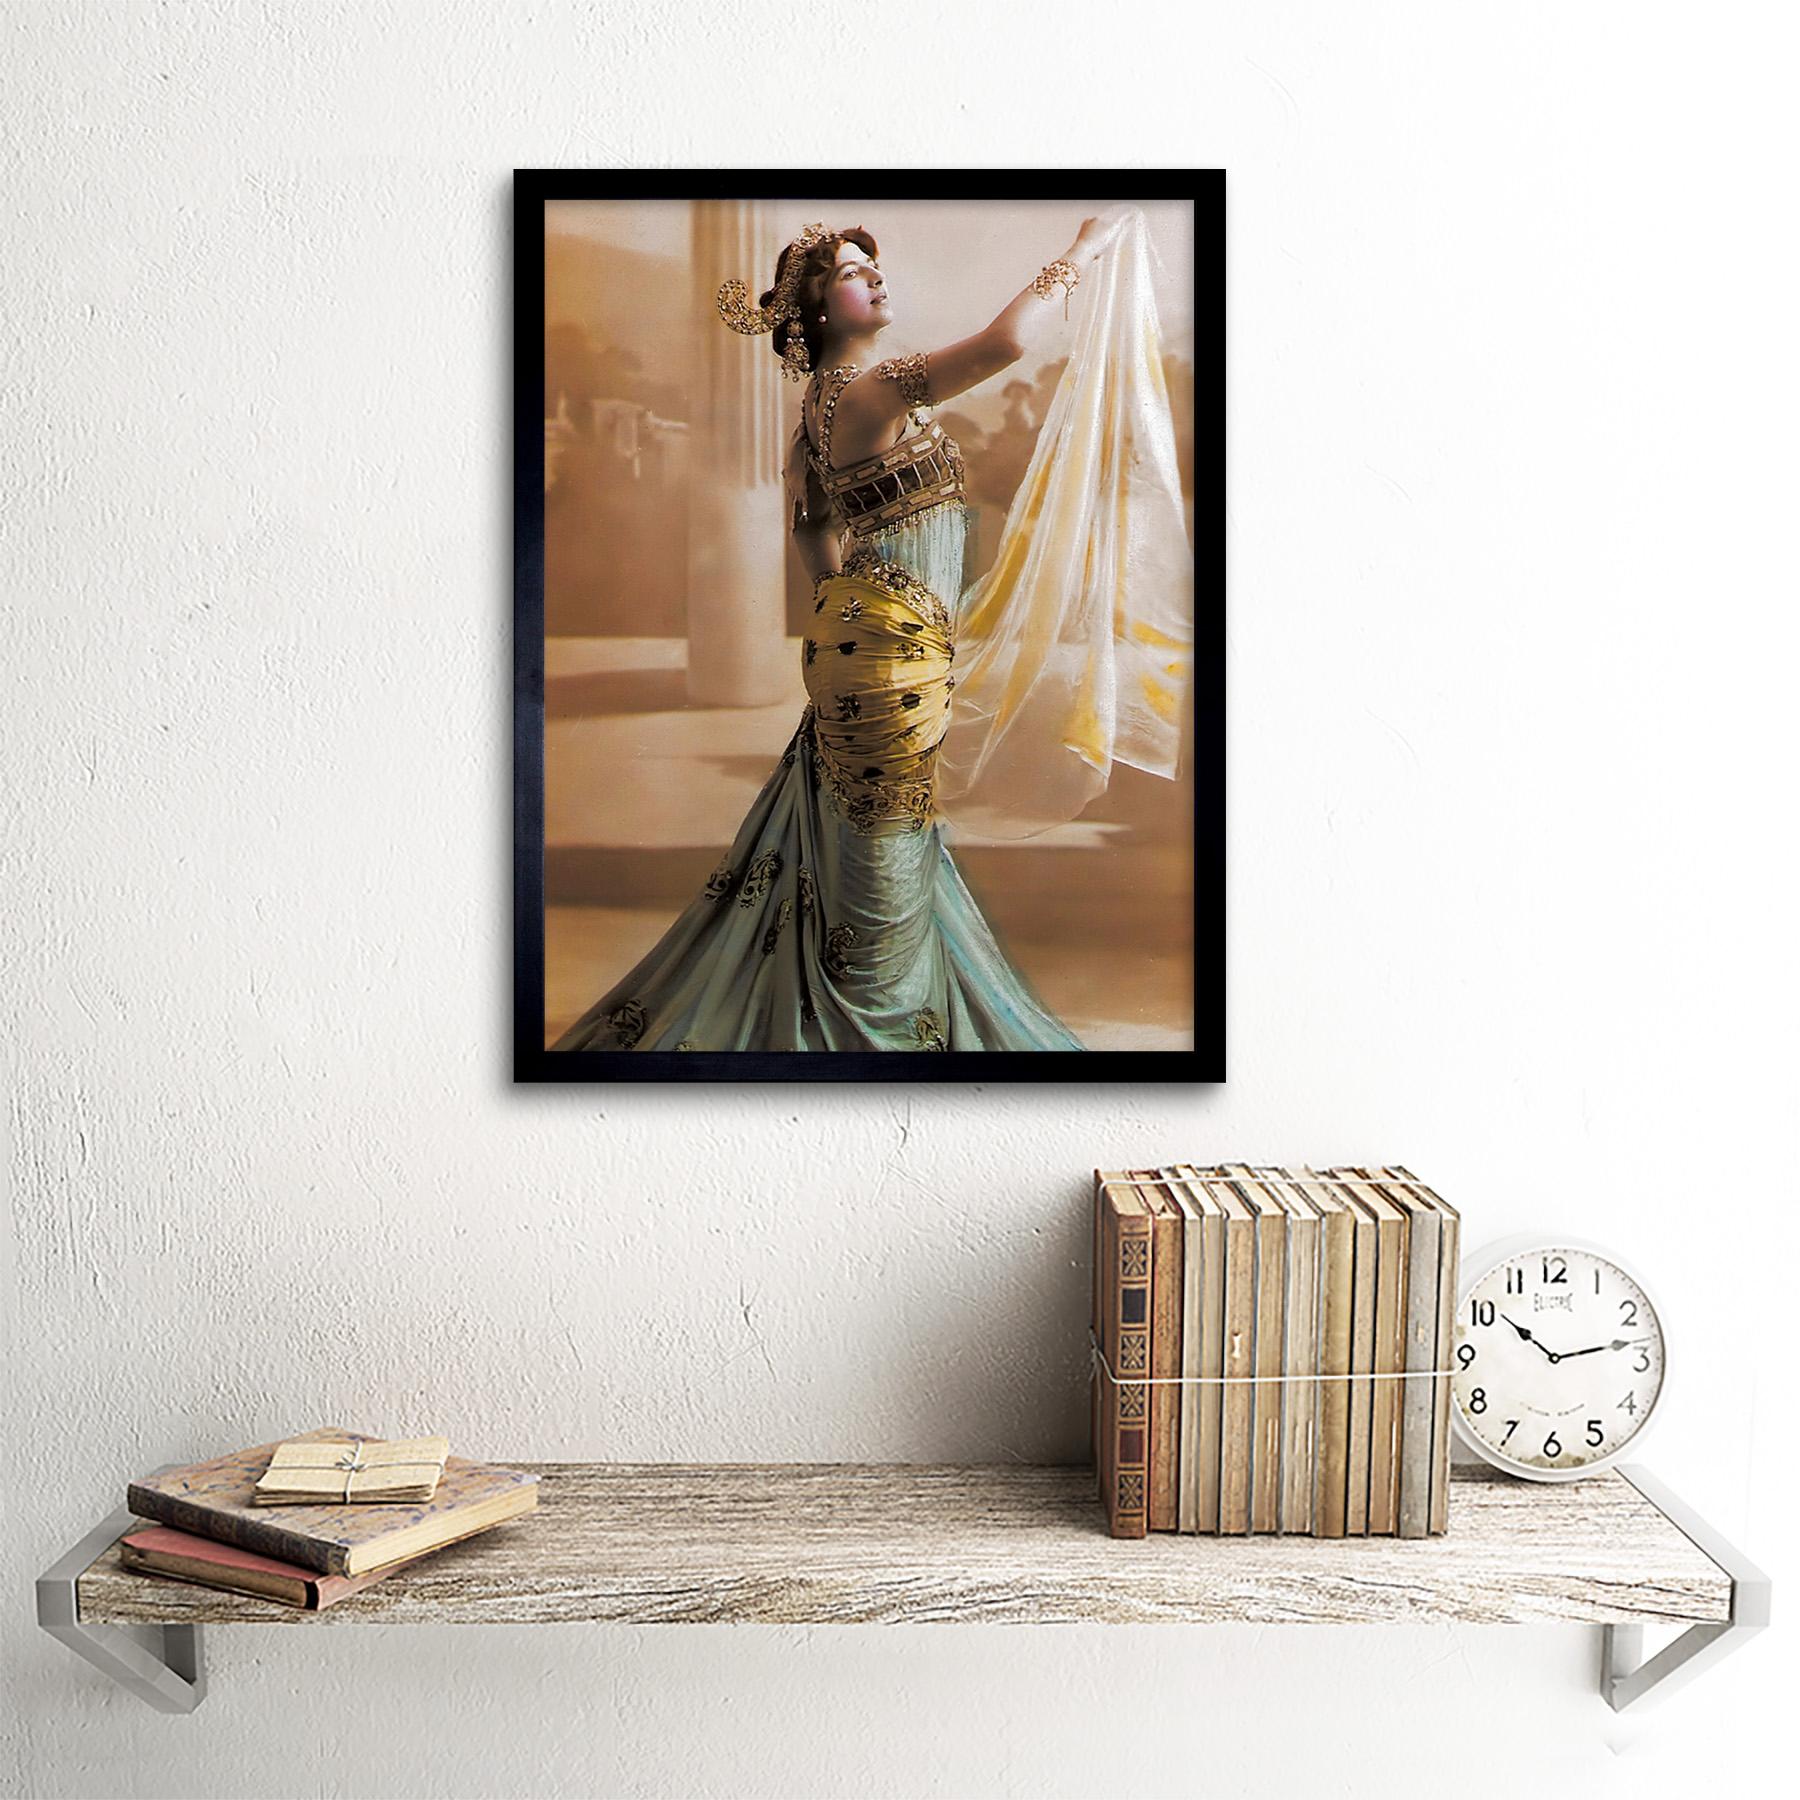 Hand-Coloured-Portrait-Dancer-Spy-Mata-Hari-Photo-Framed-Wall-Art-Poster thumbnail 3